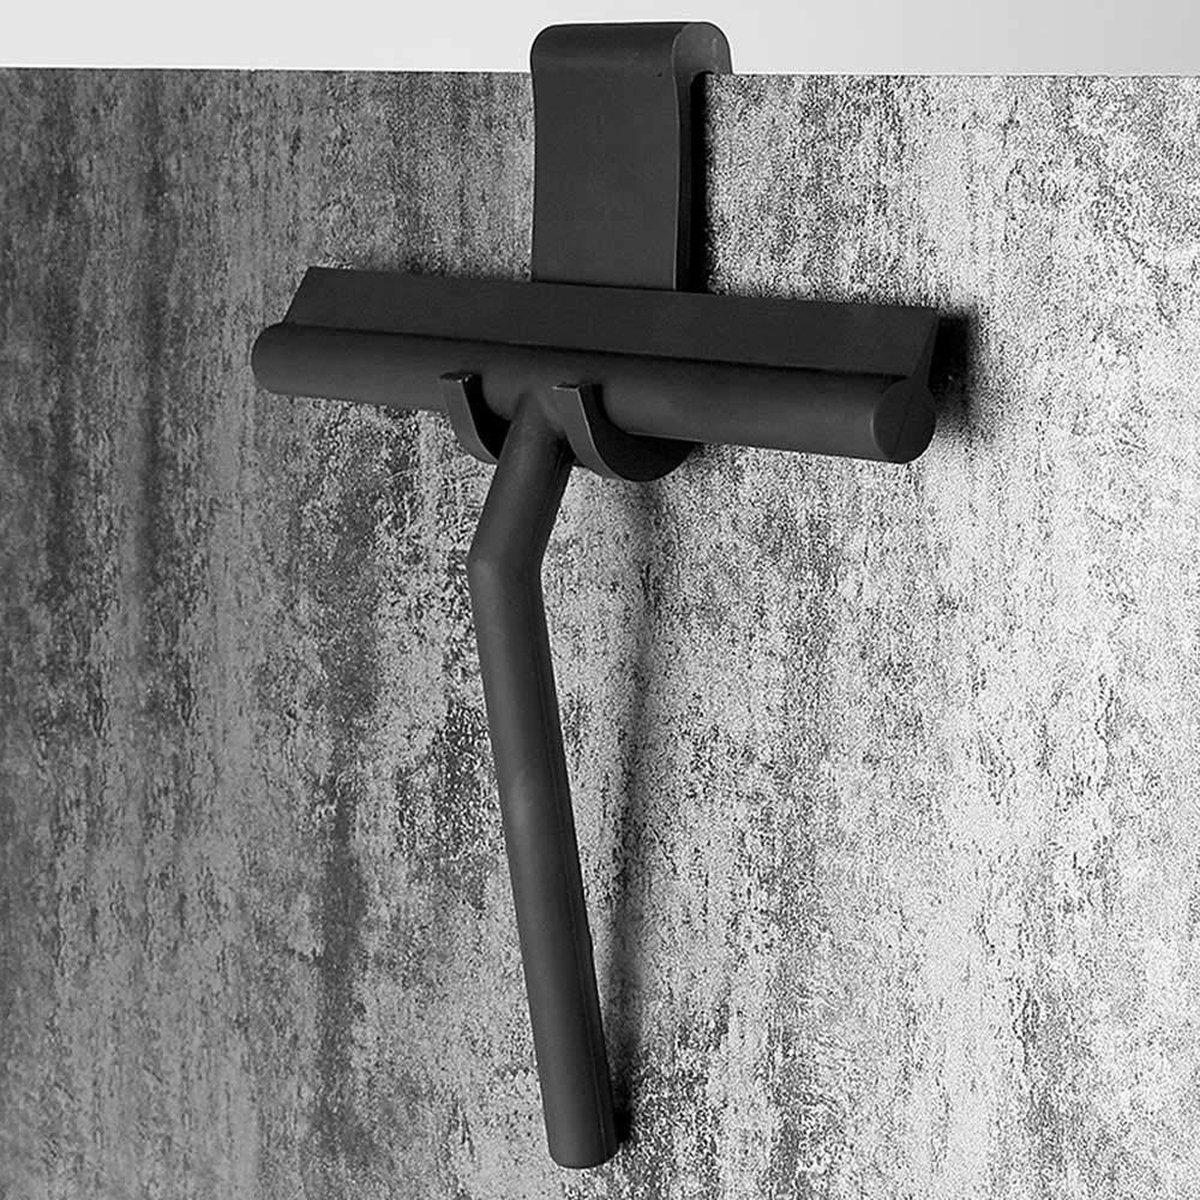 Douchewisser Zwart met Ophangsysteem- Badkamer Accessoires- Raamwisser- Trekker Douche- Silicone- 21